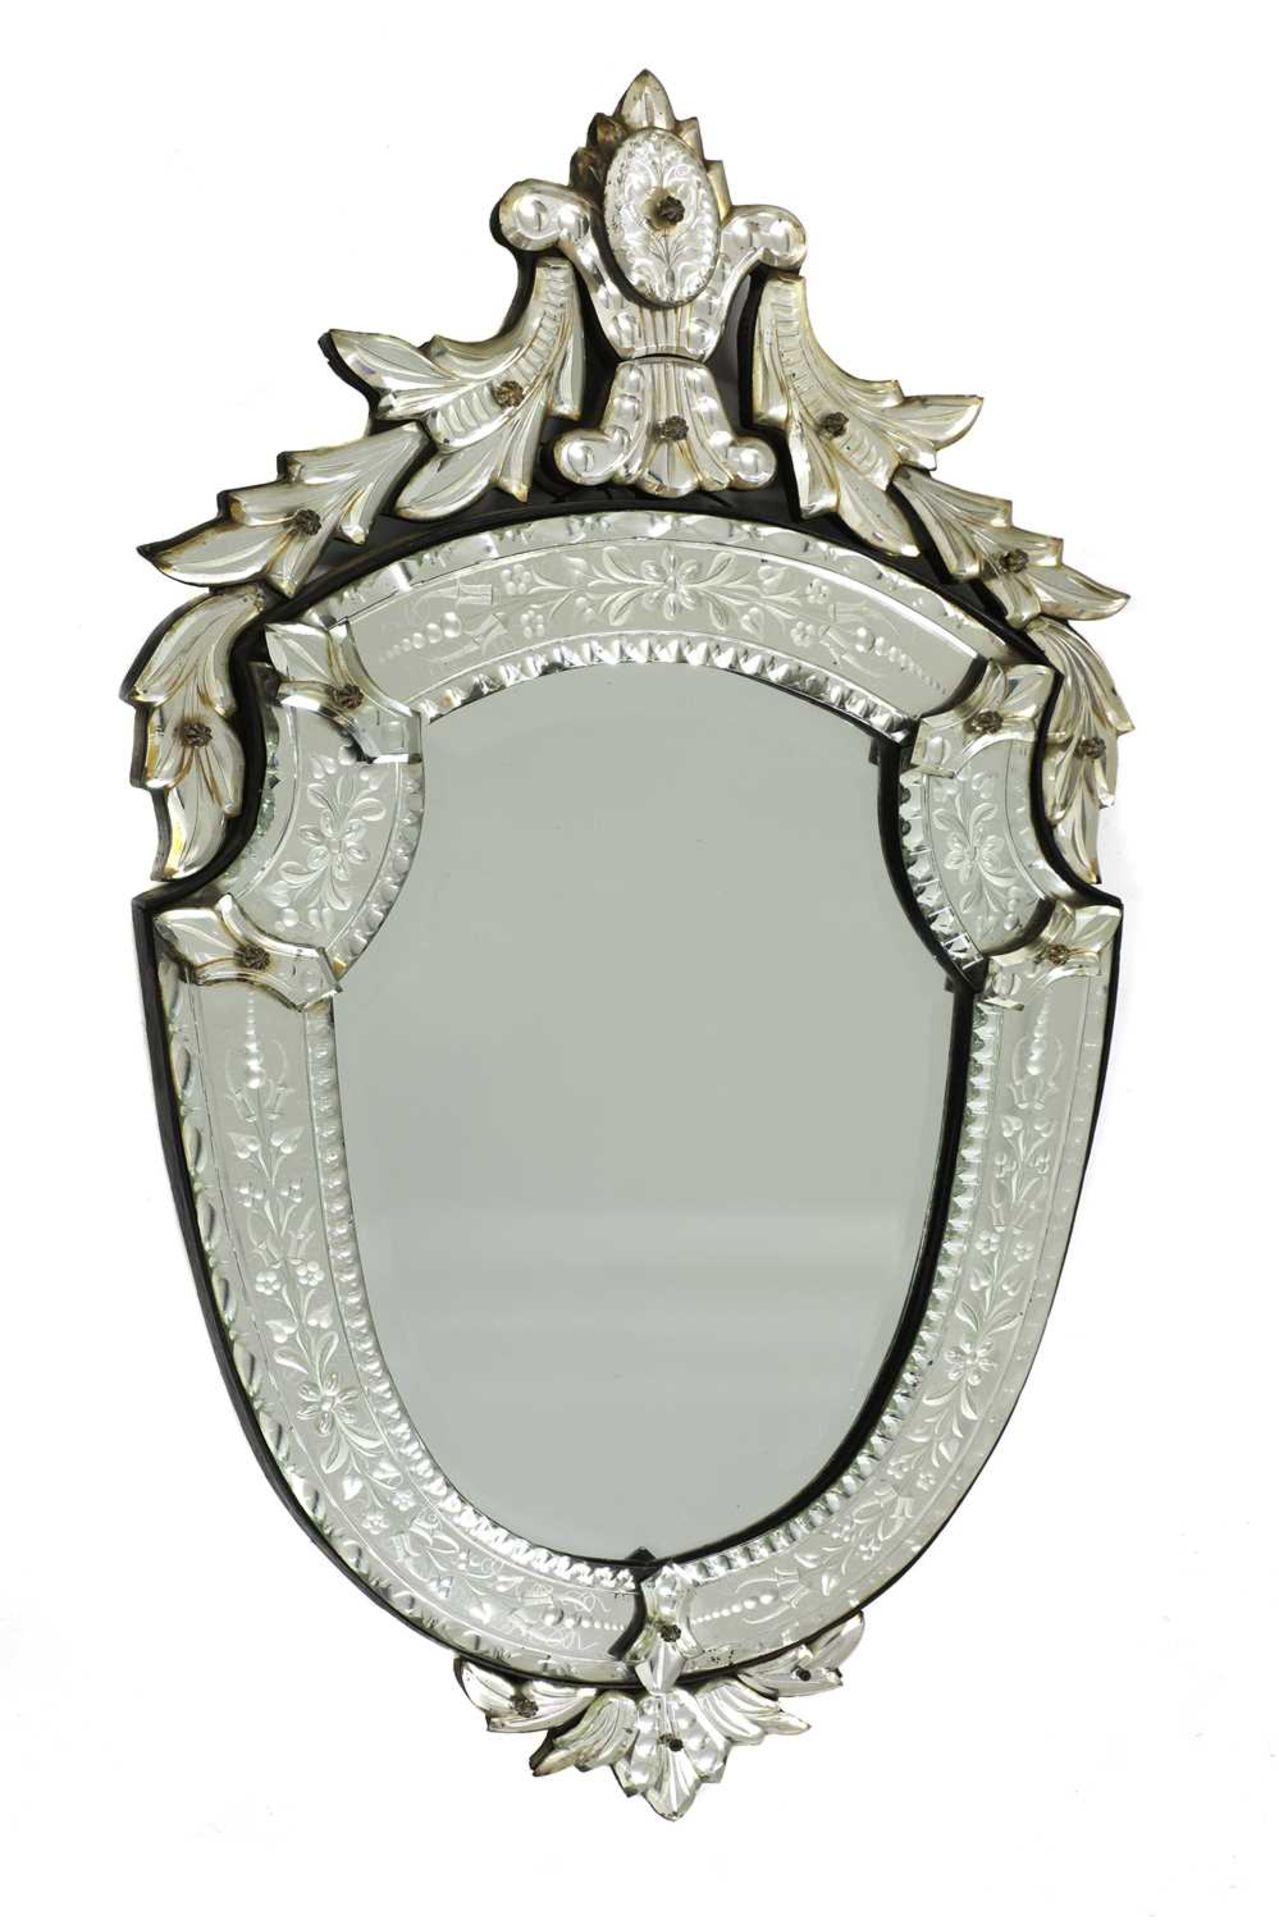 A Venetian wall mirror,